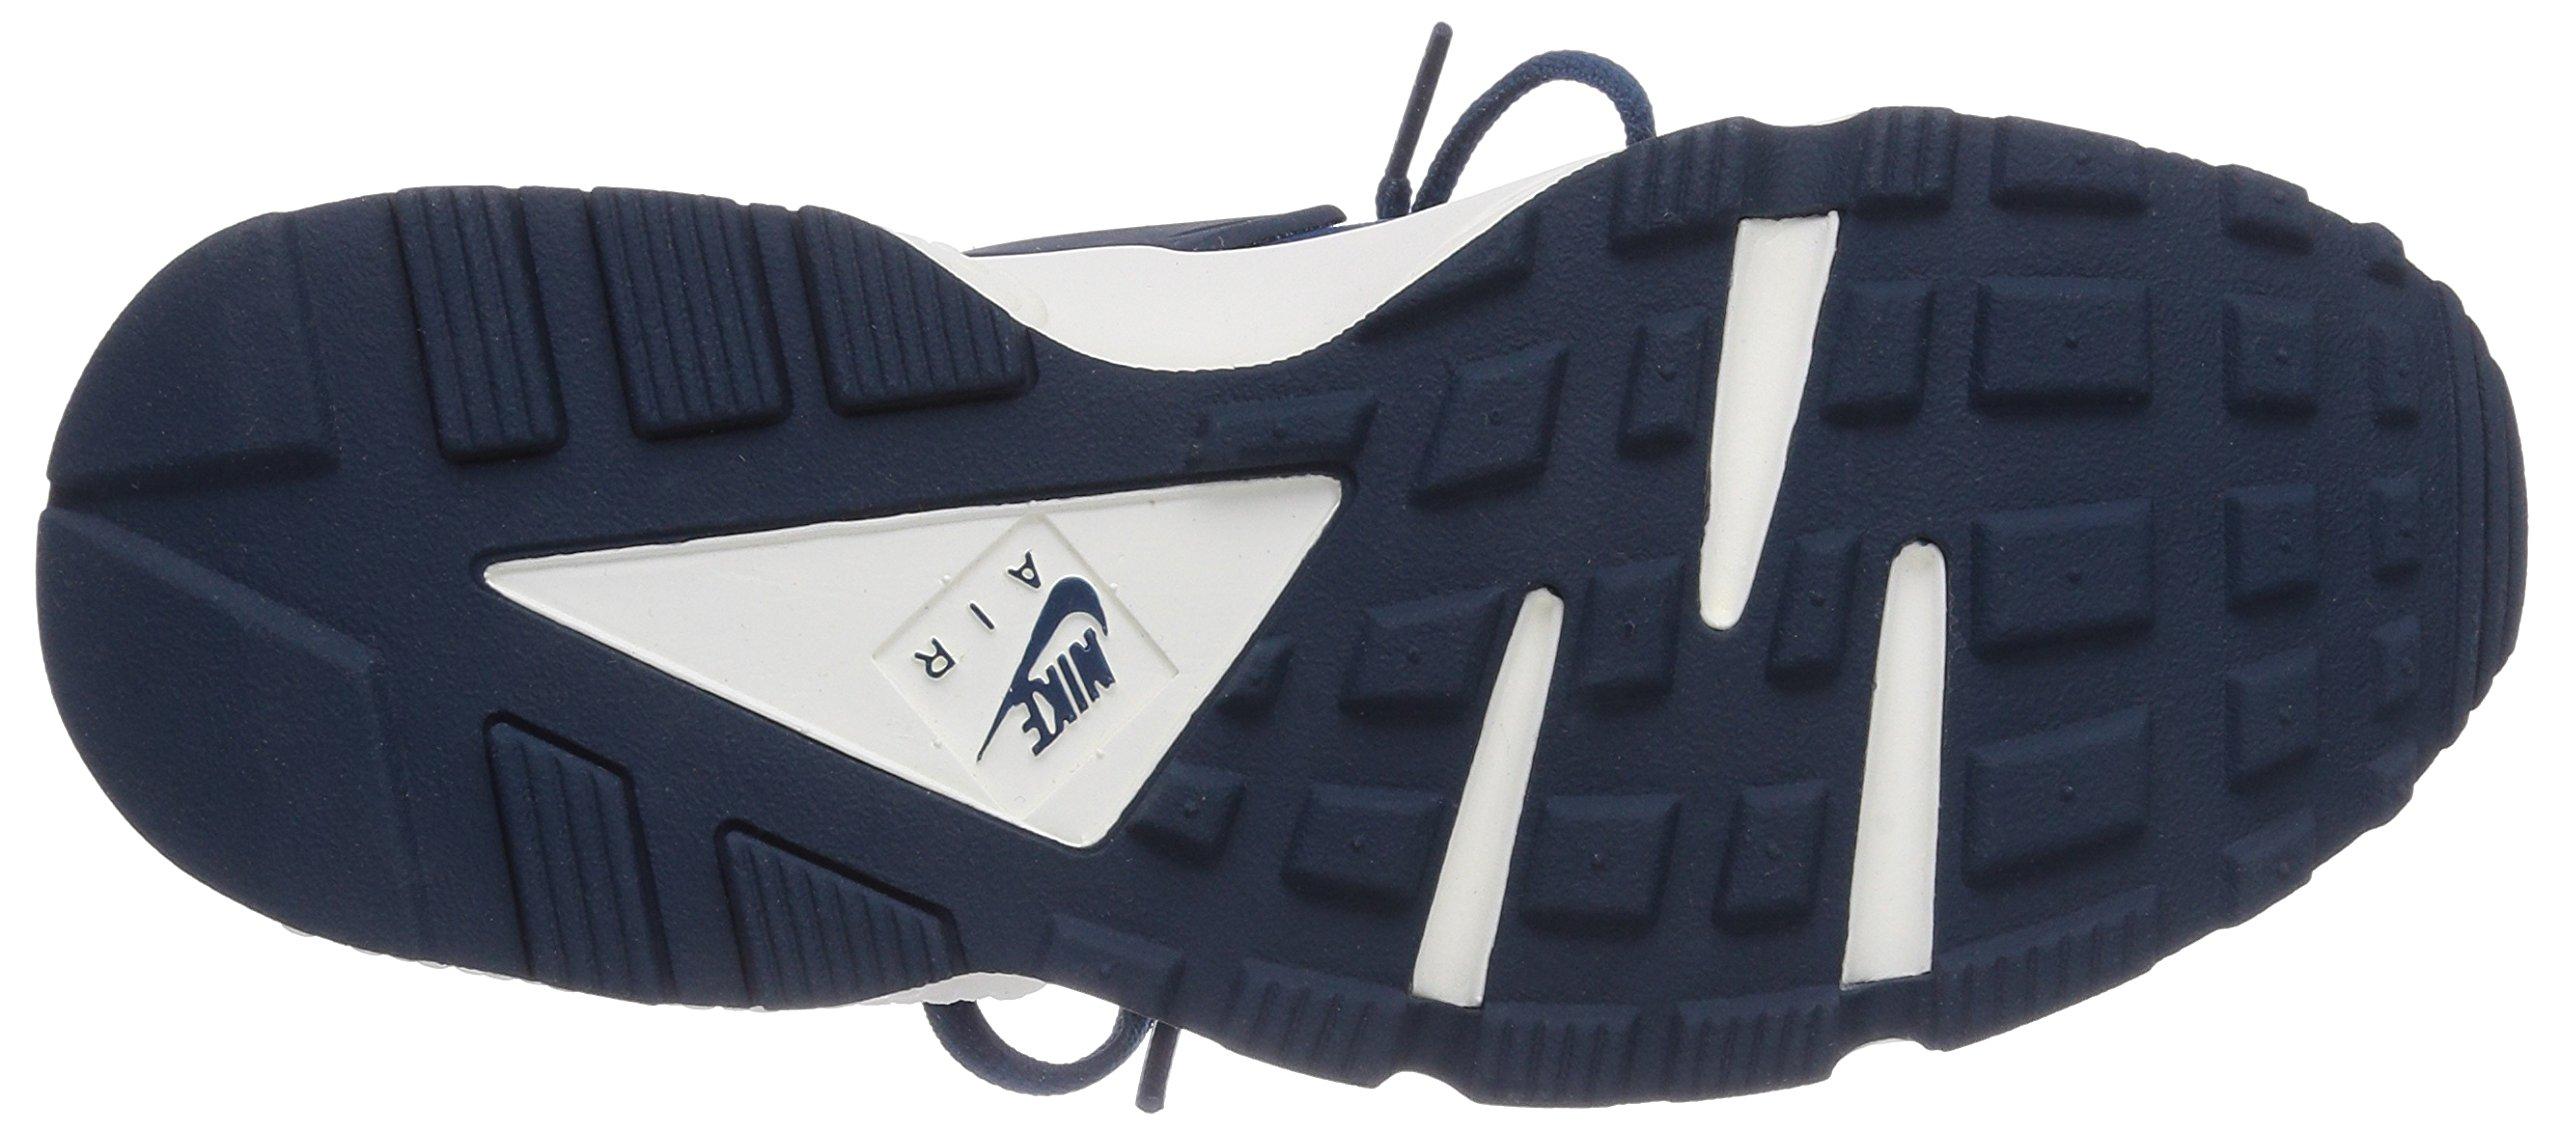 nike womens air huarache trainers 634835 sneakers shoes (UK 3 us 5.5 EU 36, blue force blue force sail 400) by NIKE (Image #3)